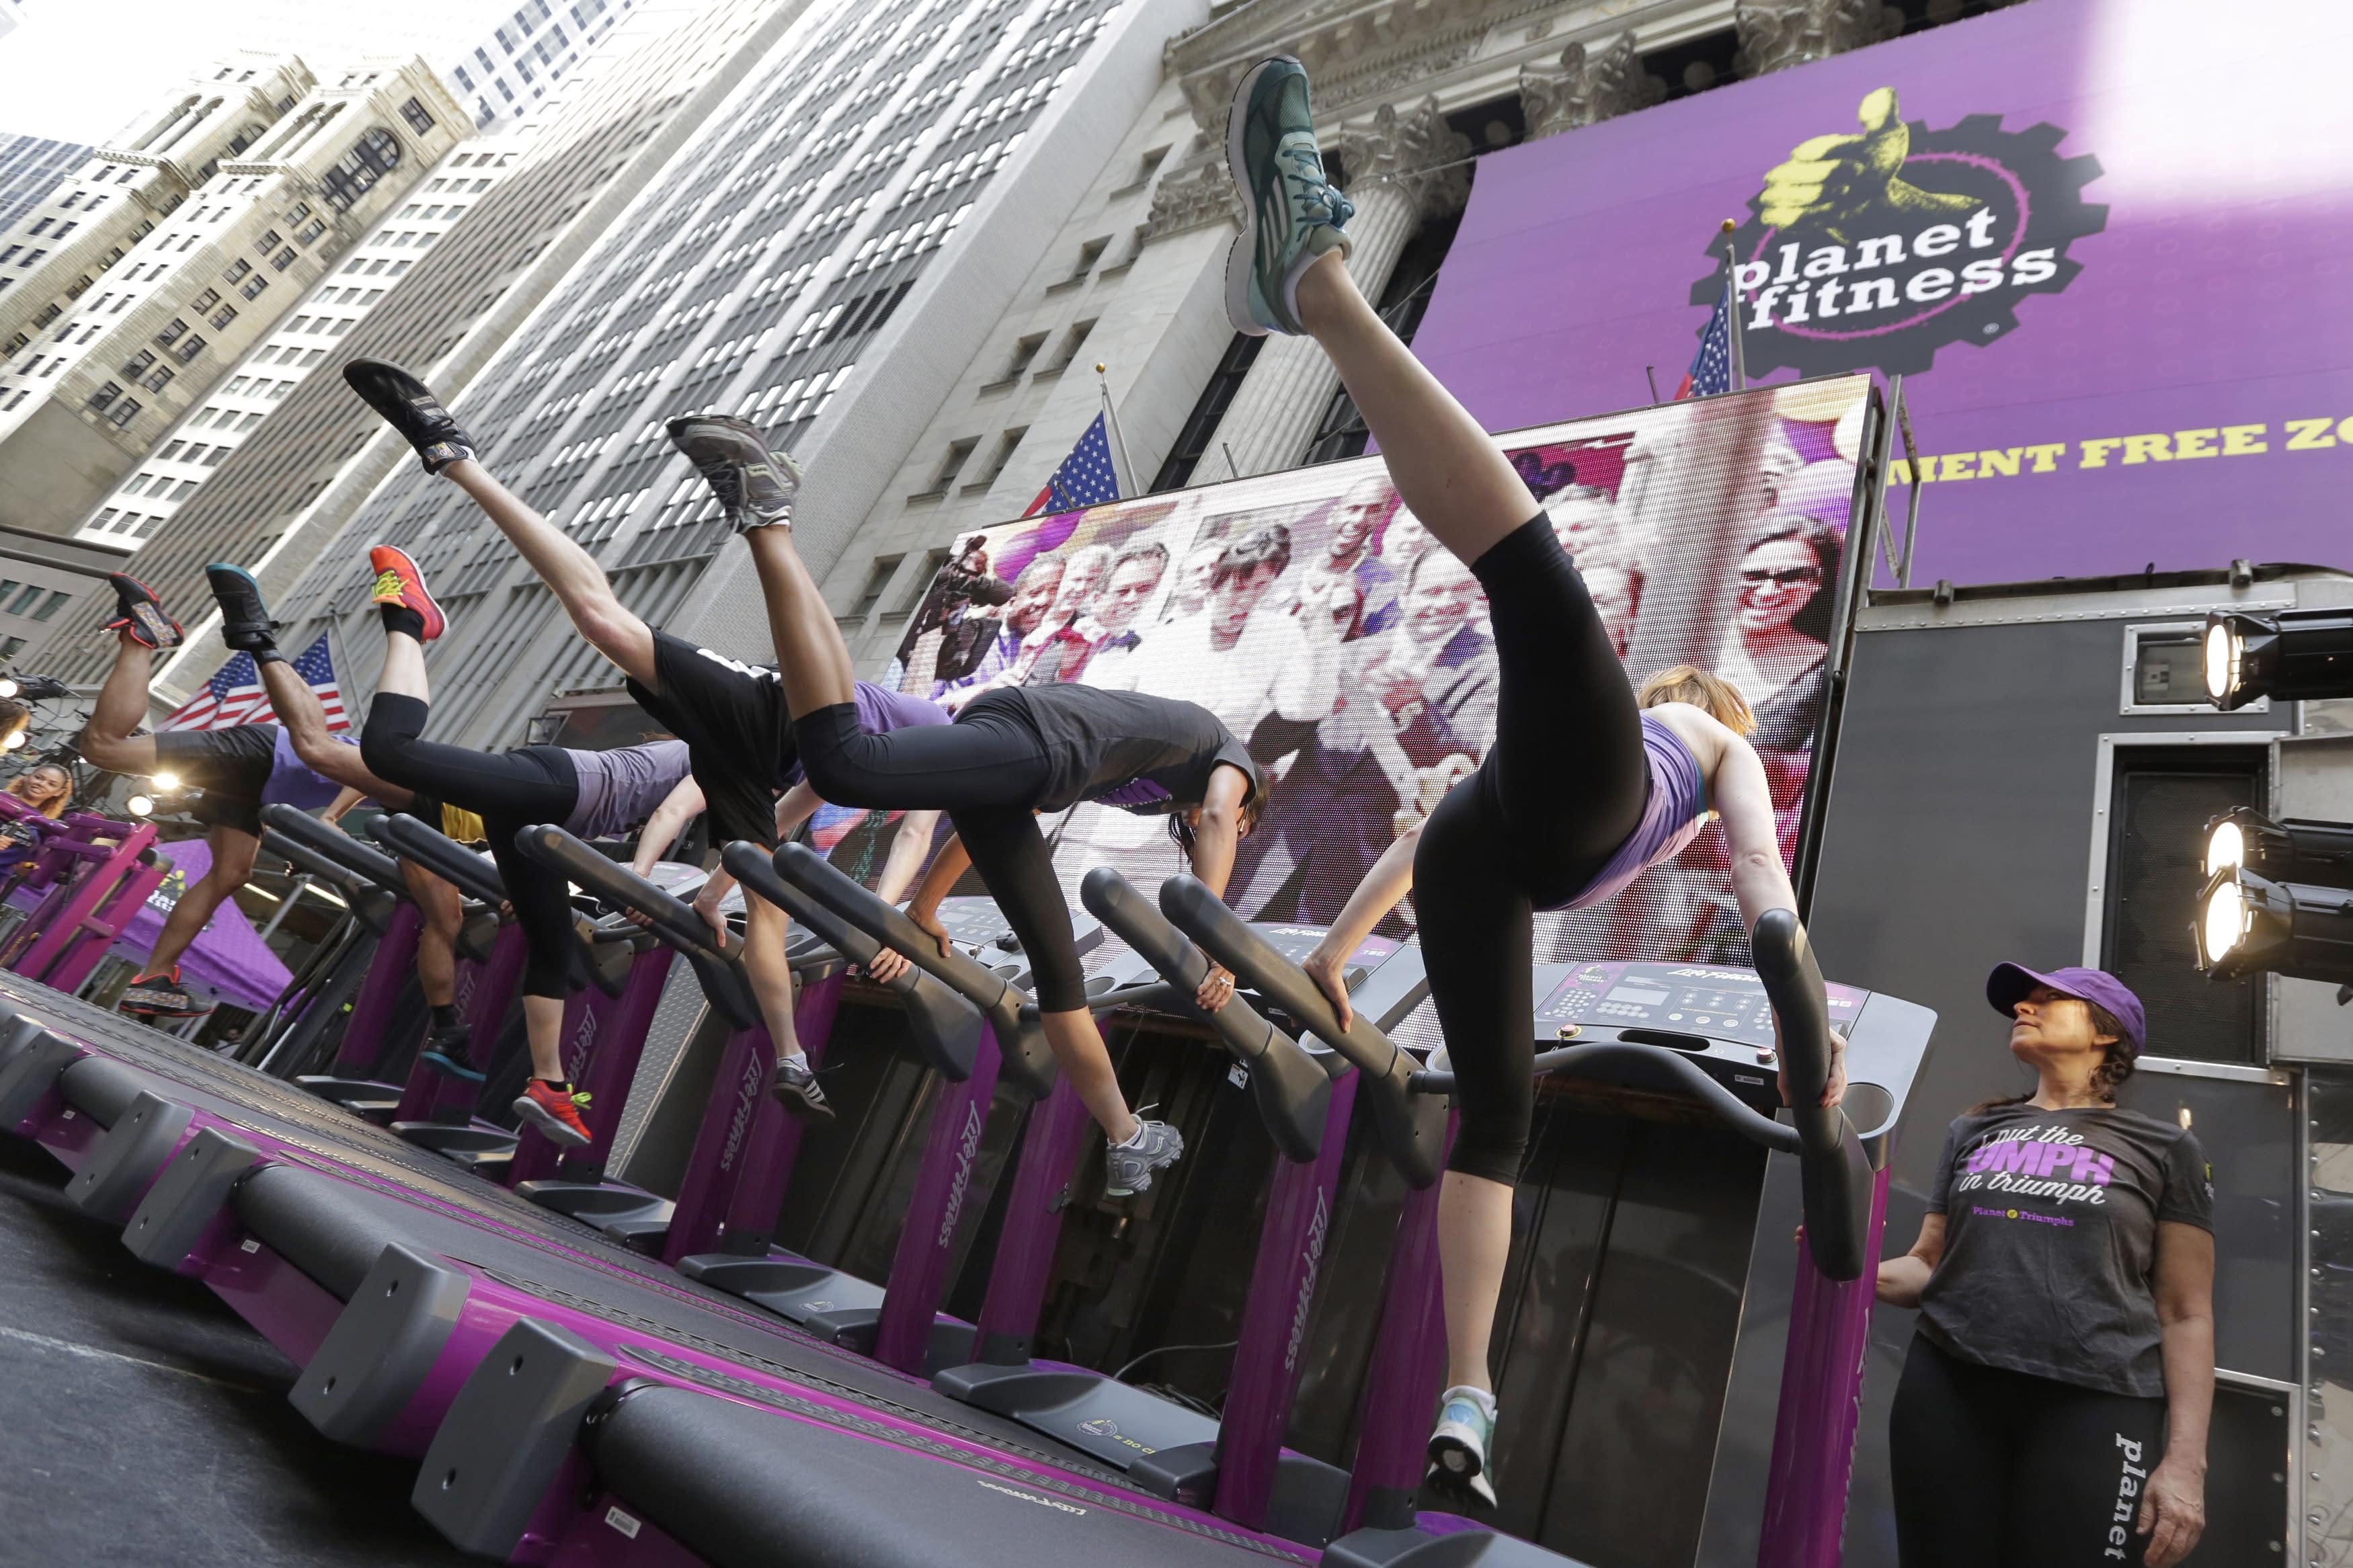 Fitness Equipment Kitchener